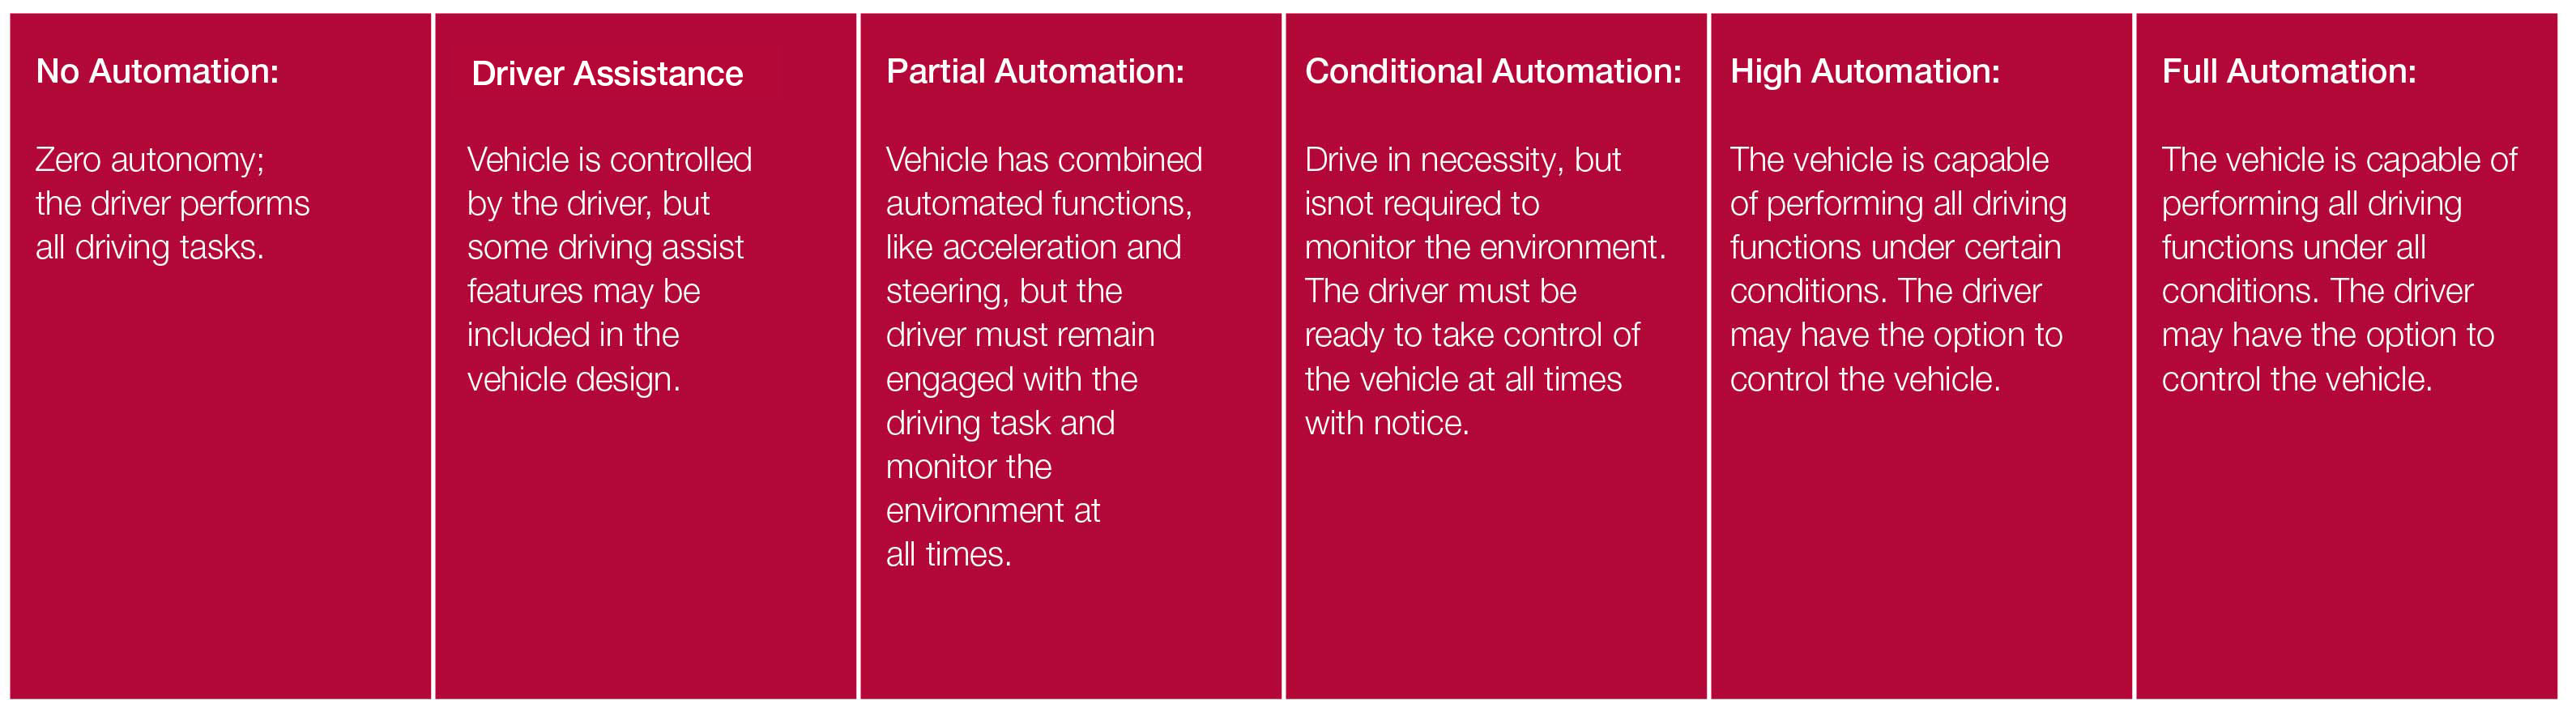 sae-automation-levels_